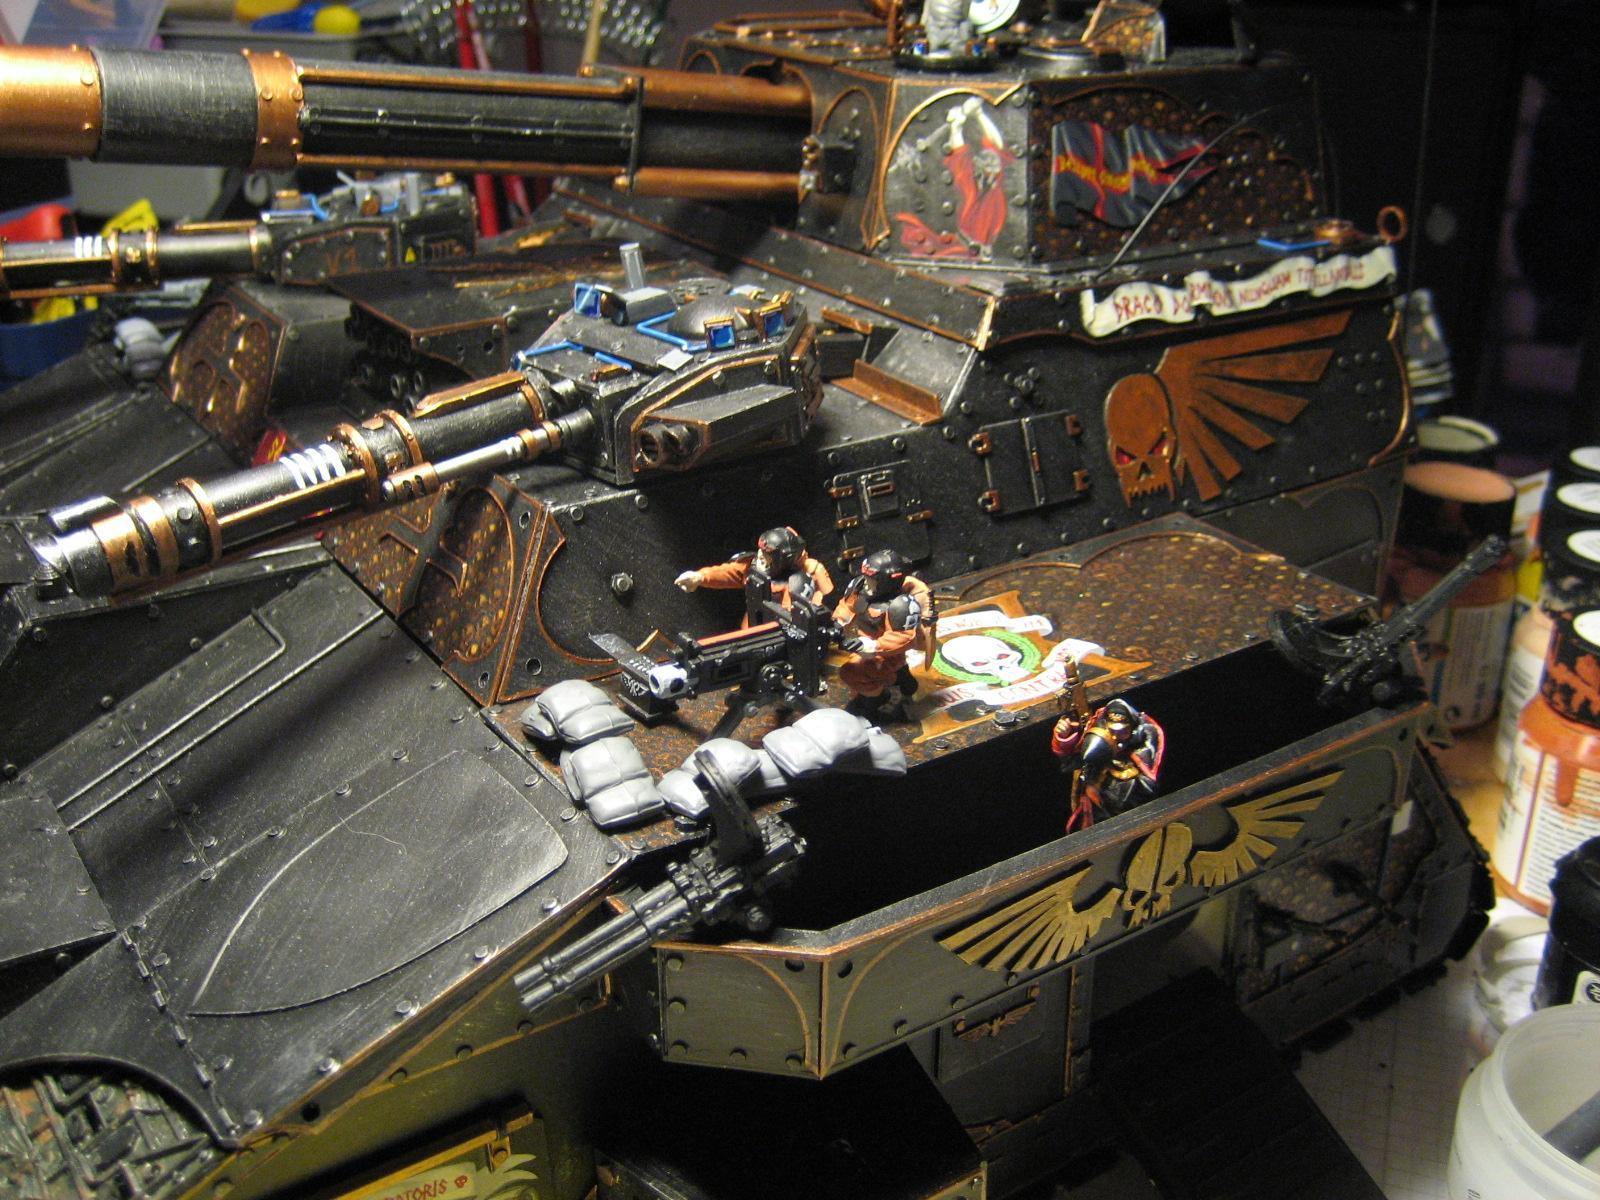 Baneblade, Mega Baneblade, Warhammer 40,000